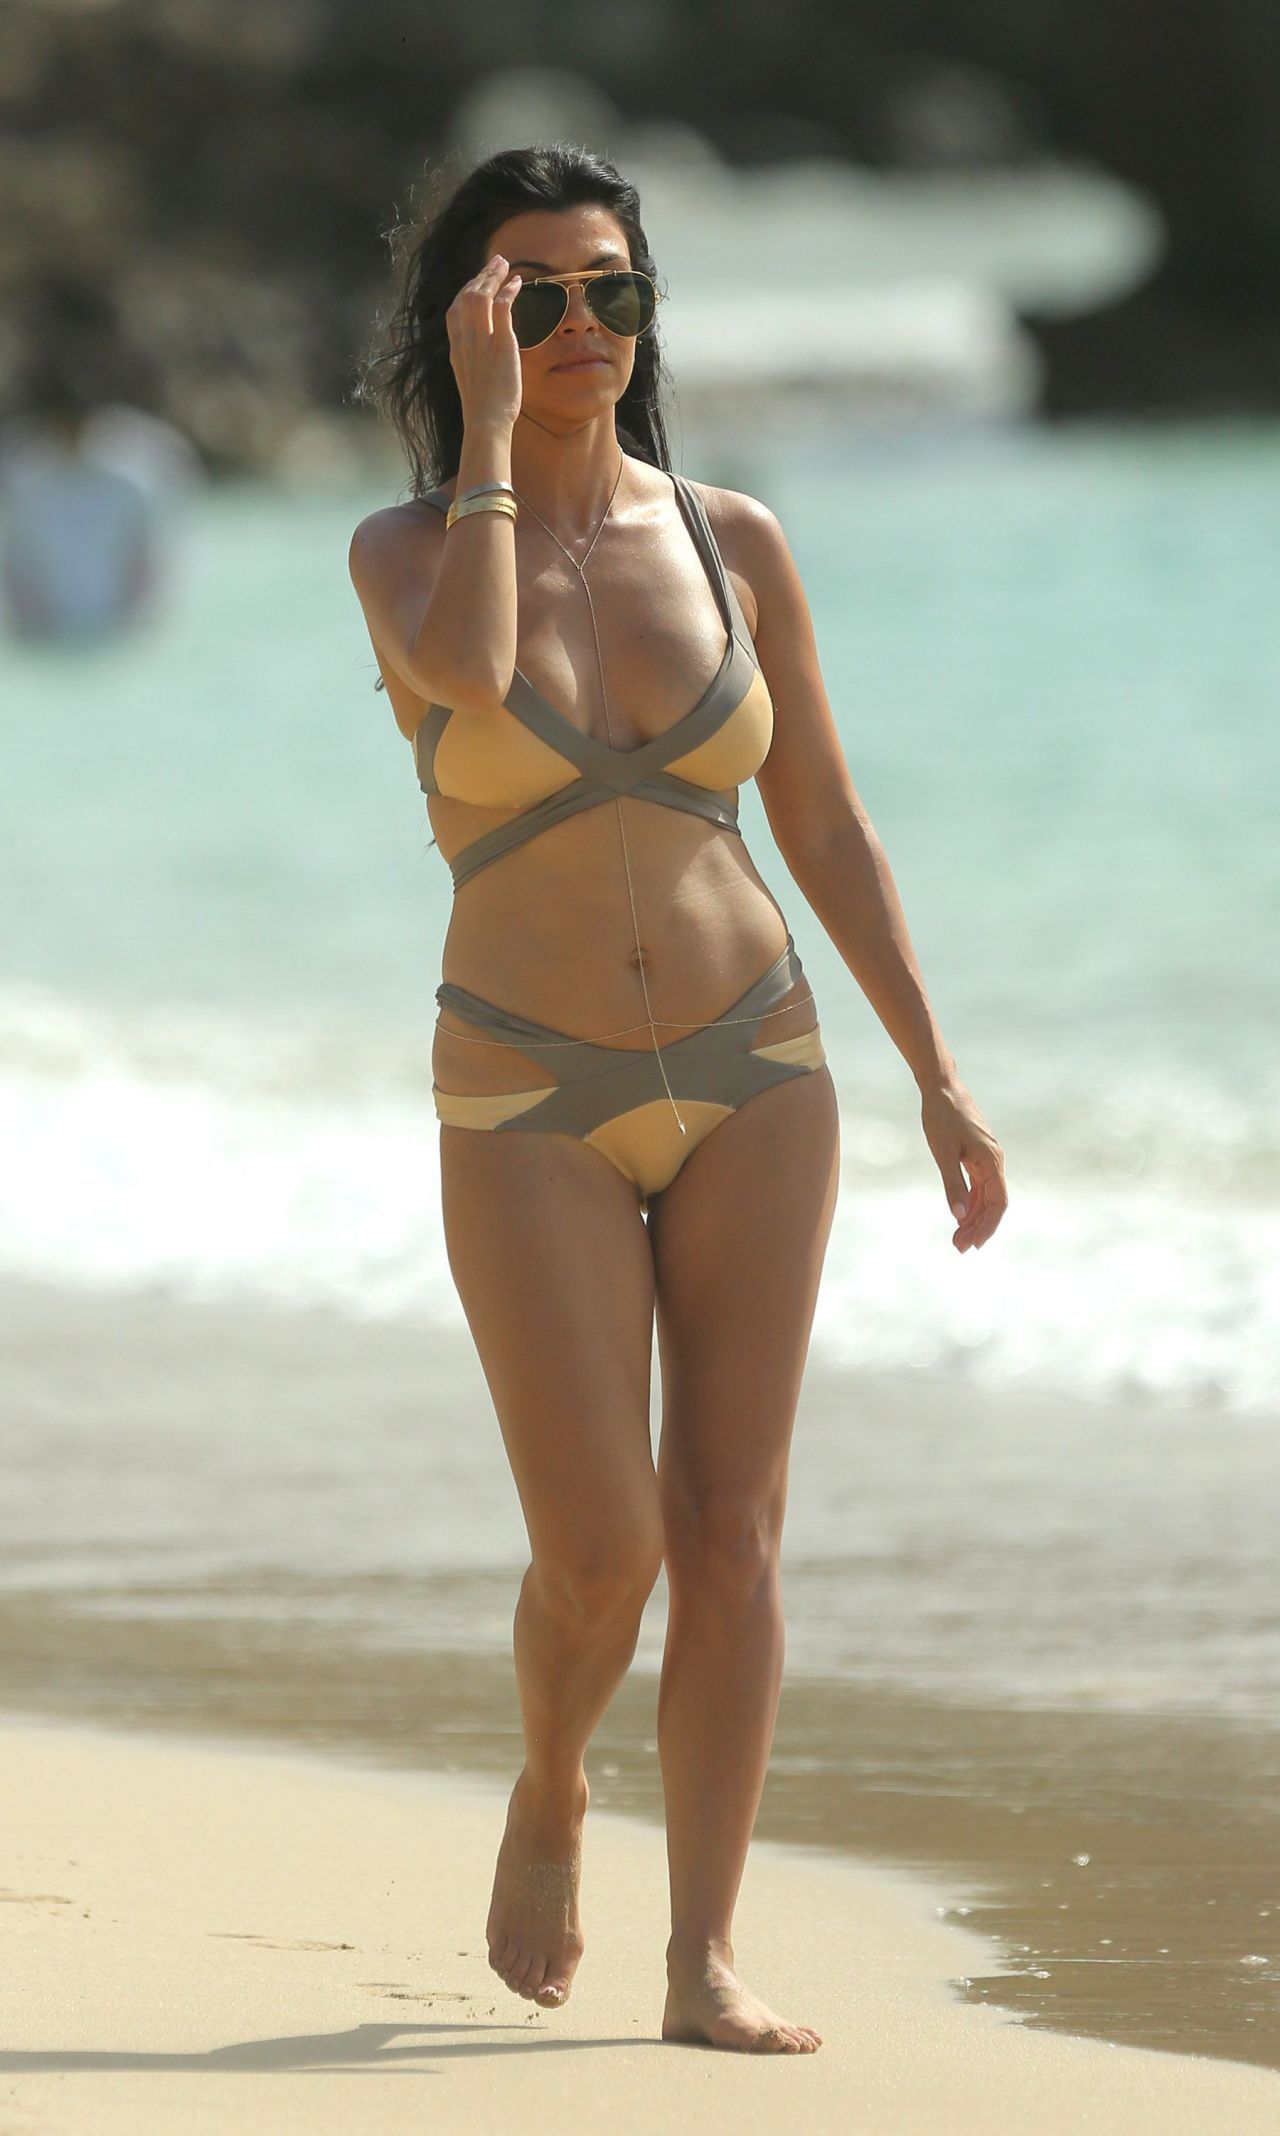 kourtney-kardashian-bikini-pics-on-vacation-at-the-beach-in-st.-barts-august-2015_4